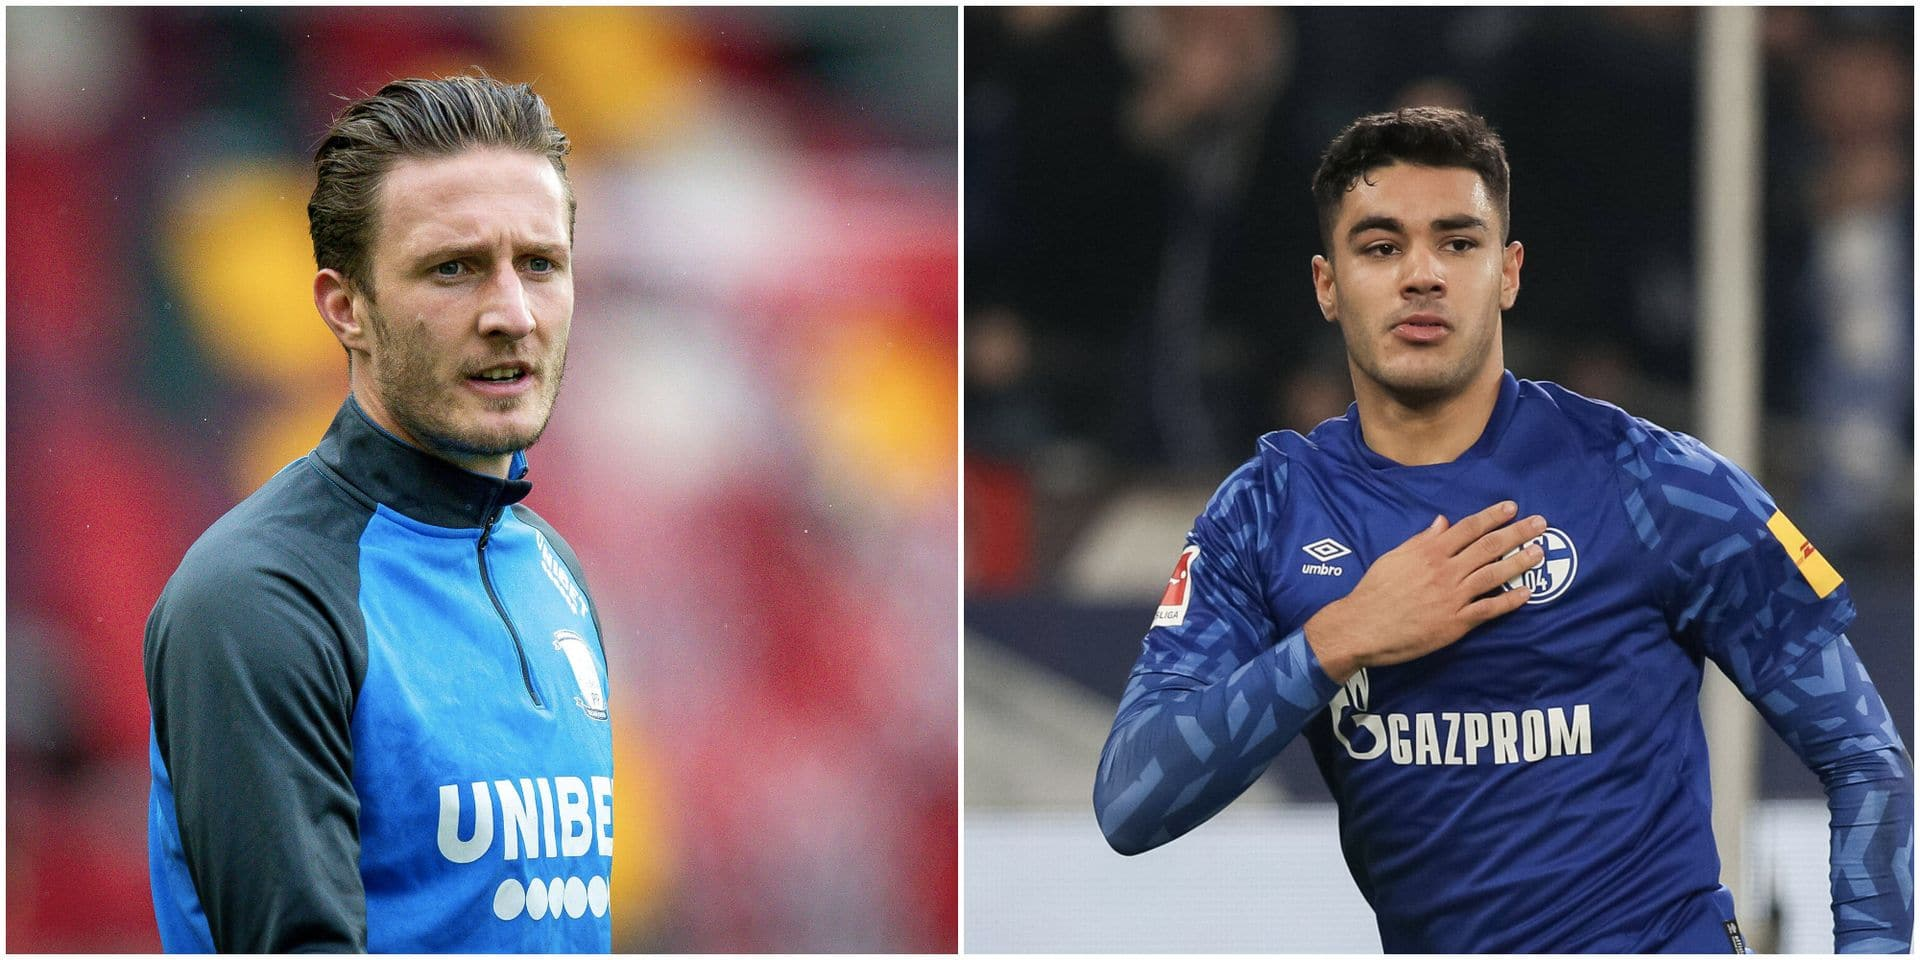 Pourquoi Liverpool a opté pour Ben Davies et Ozan Kabak ?